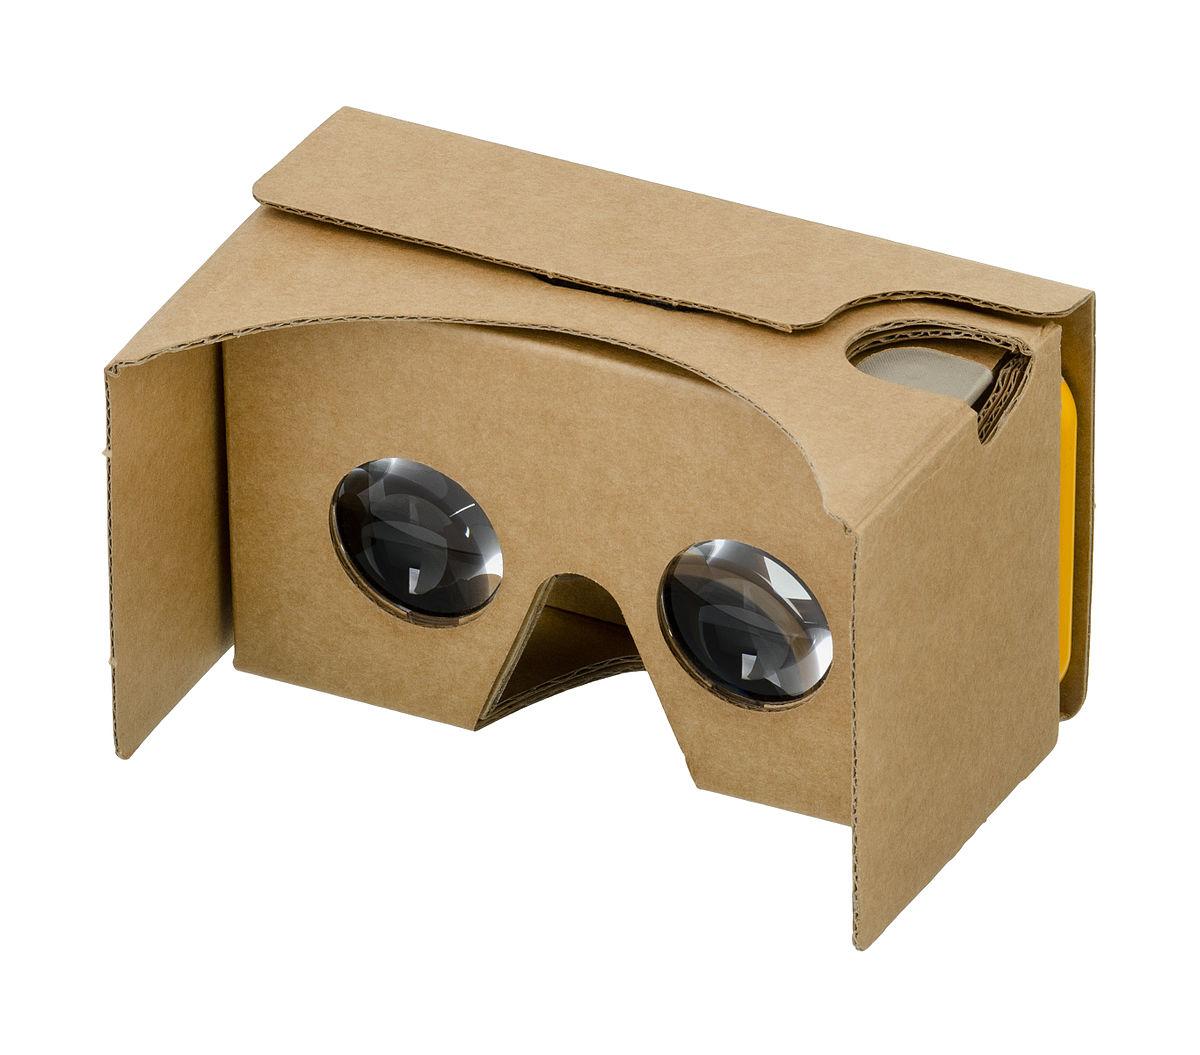 Google Daydream specimens